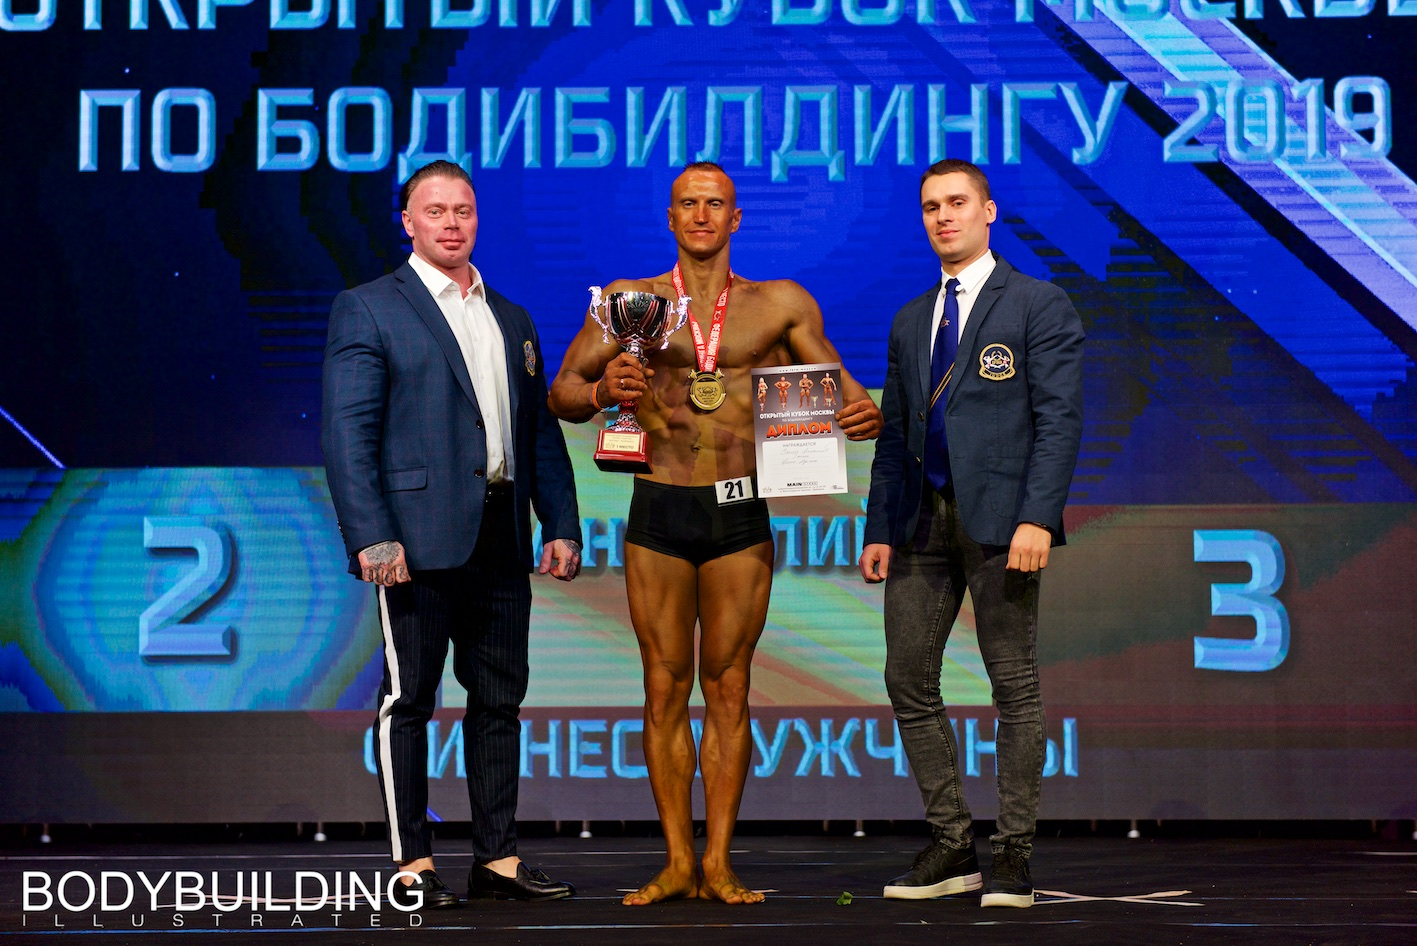 Кубок Москвы по бодибилдингу 2019 фитнес мужчины